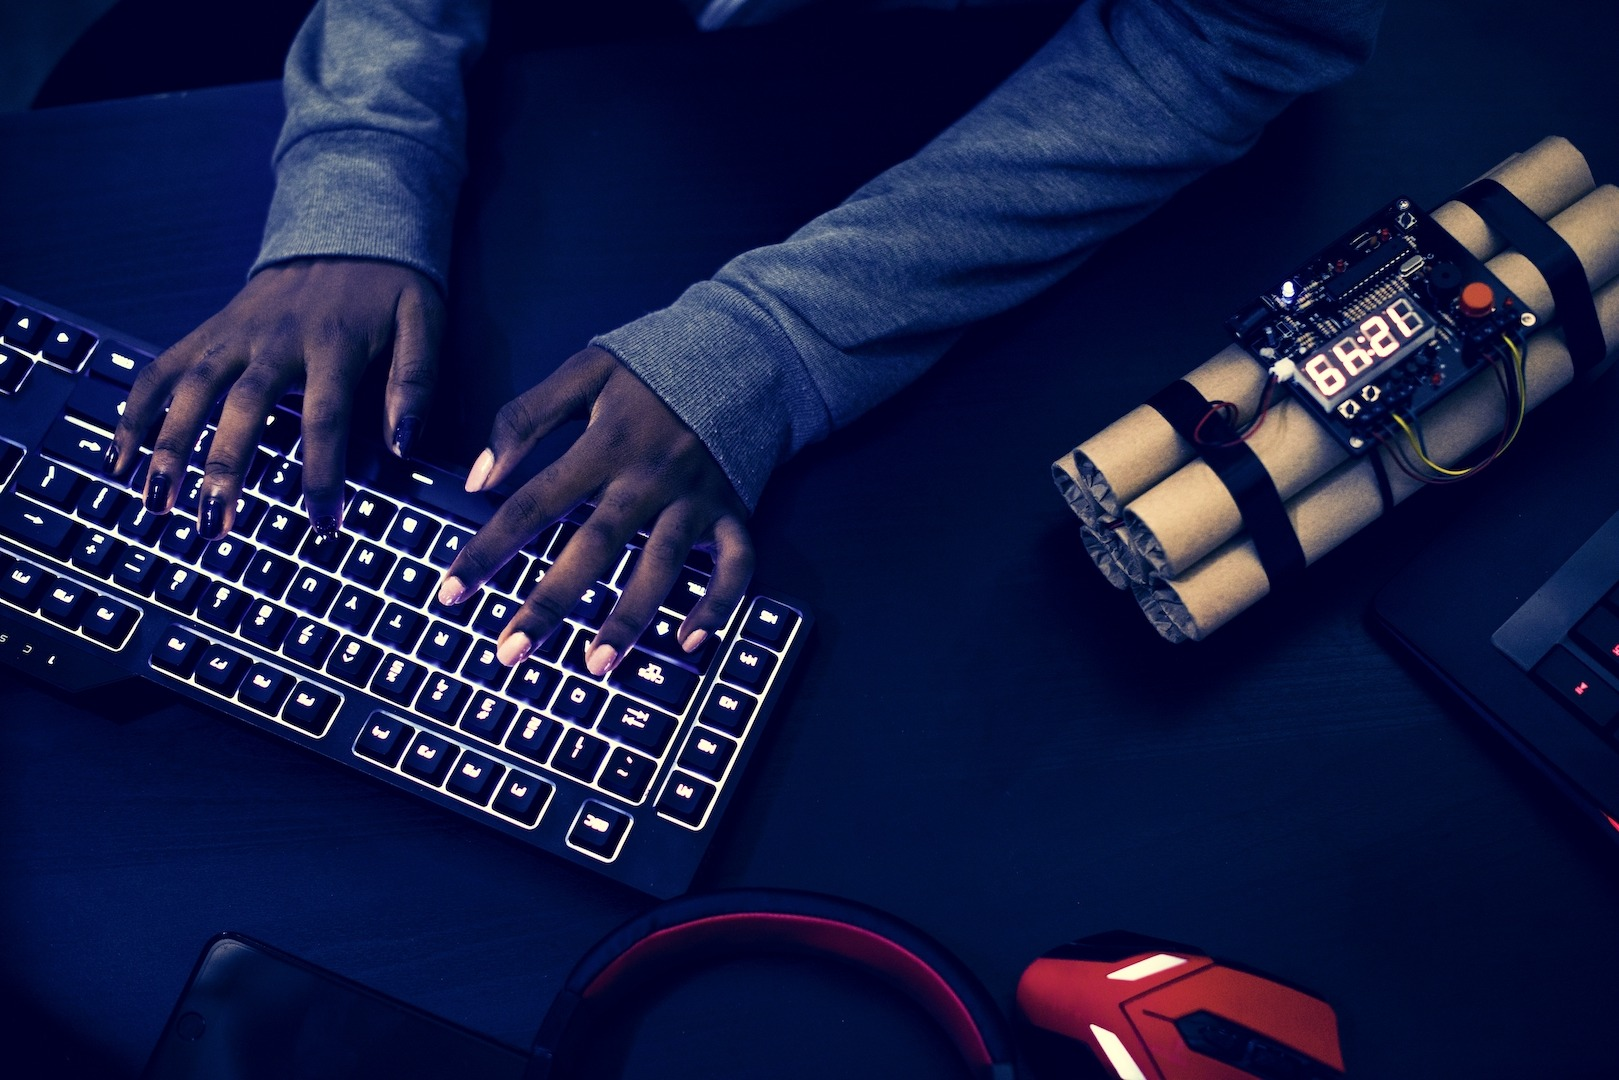 Hacker faz ataque phishing